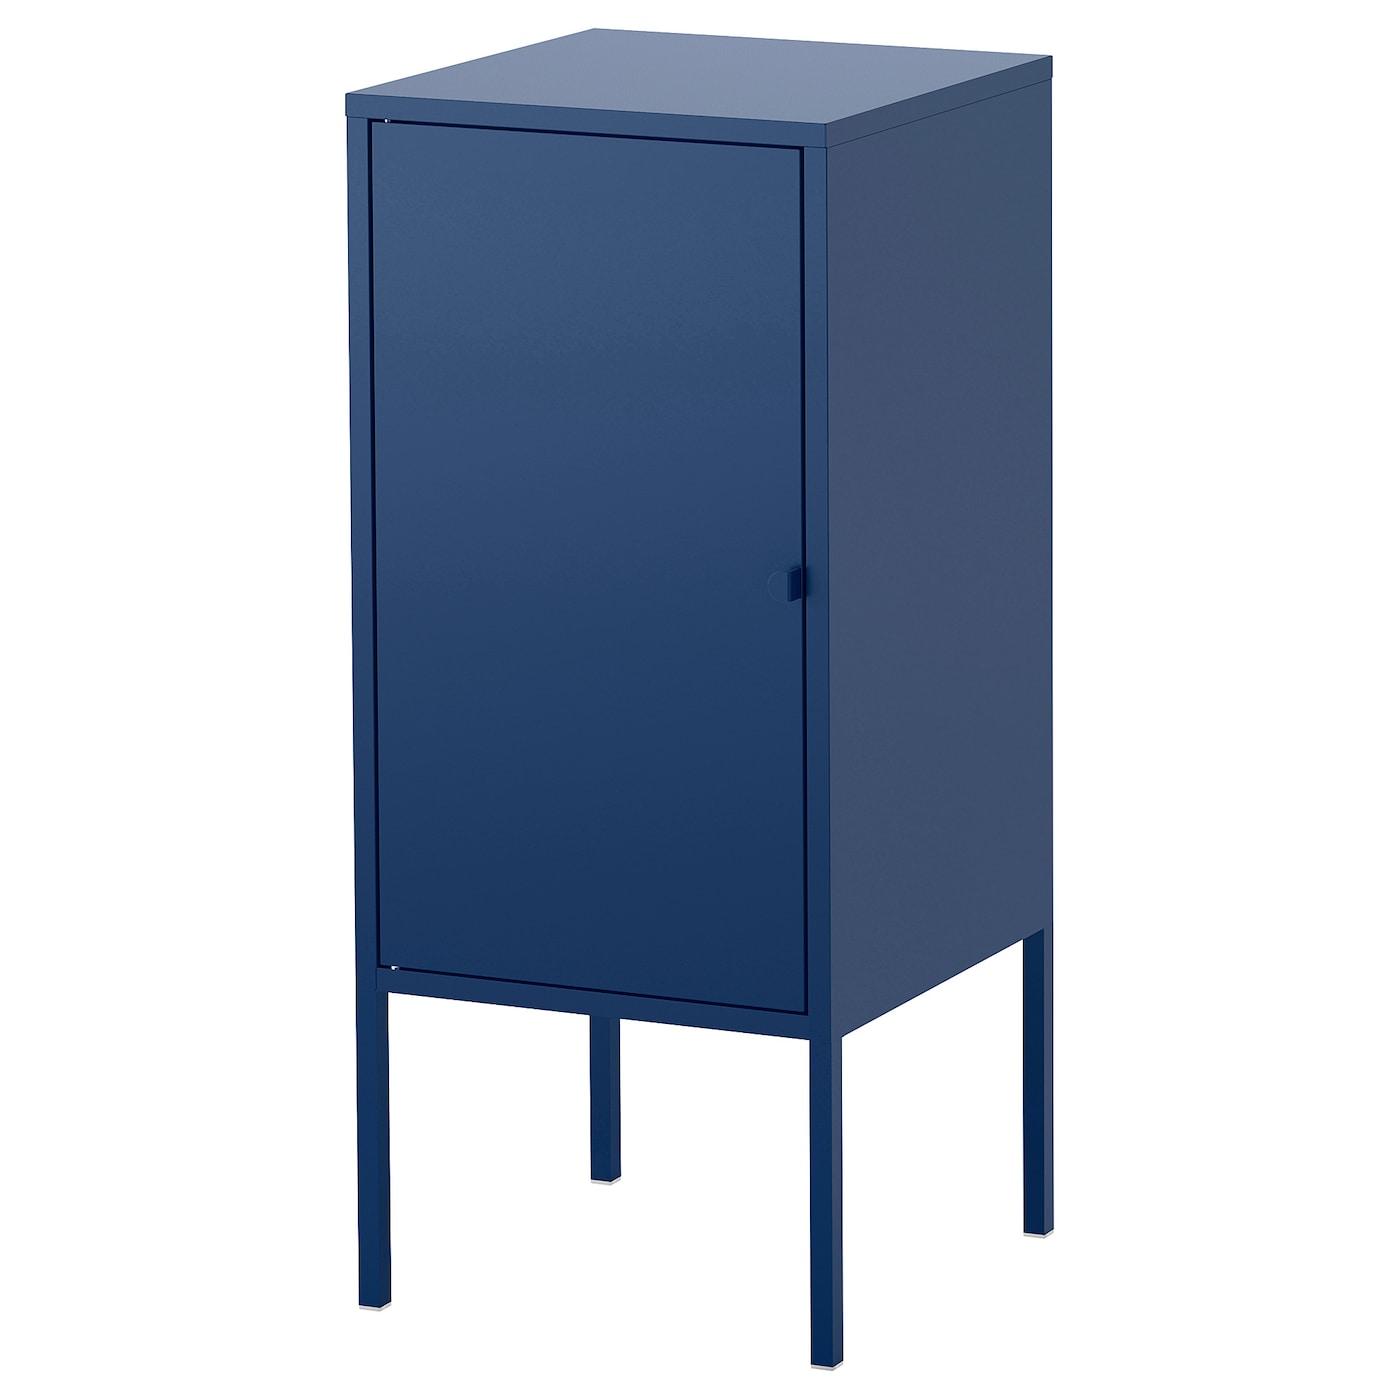 lixhult rangement m tal bleu fonc 35x60 cm ikea. Black Bedroom Furniture Sets. Home Design Ideas